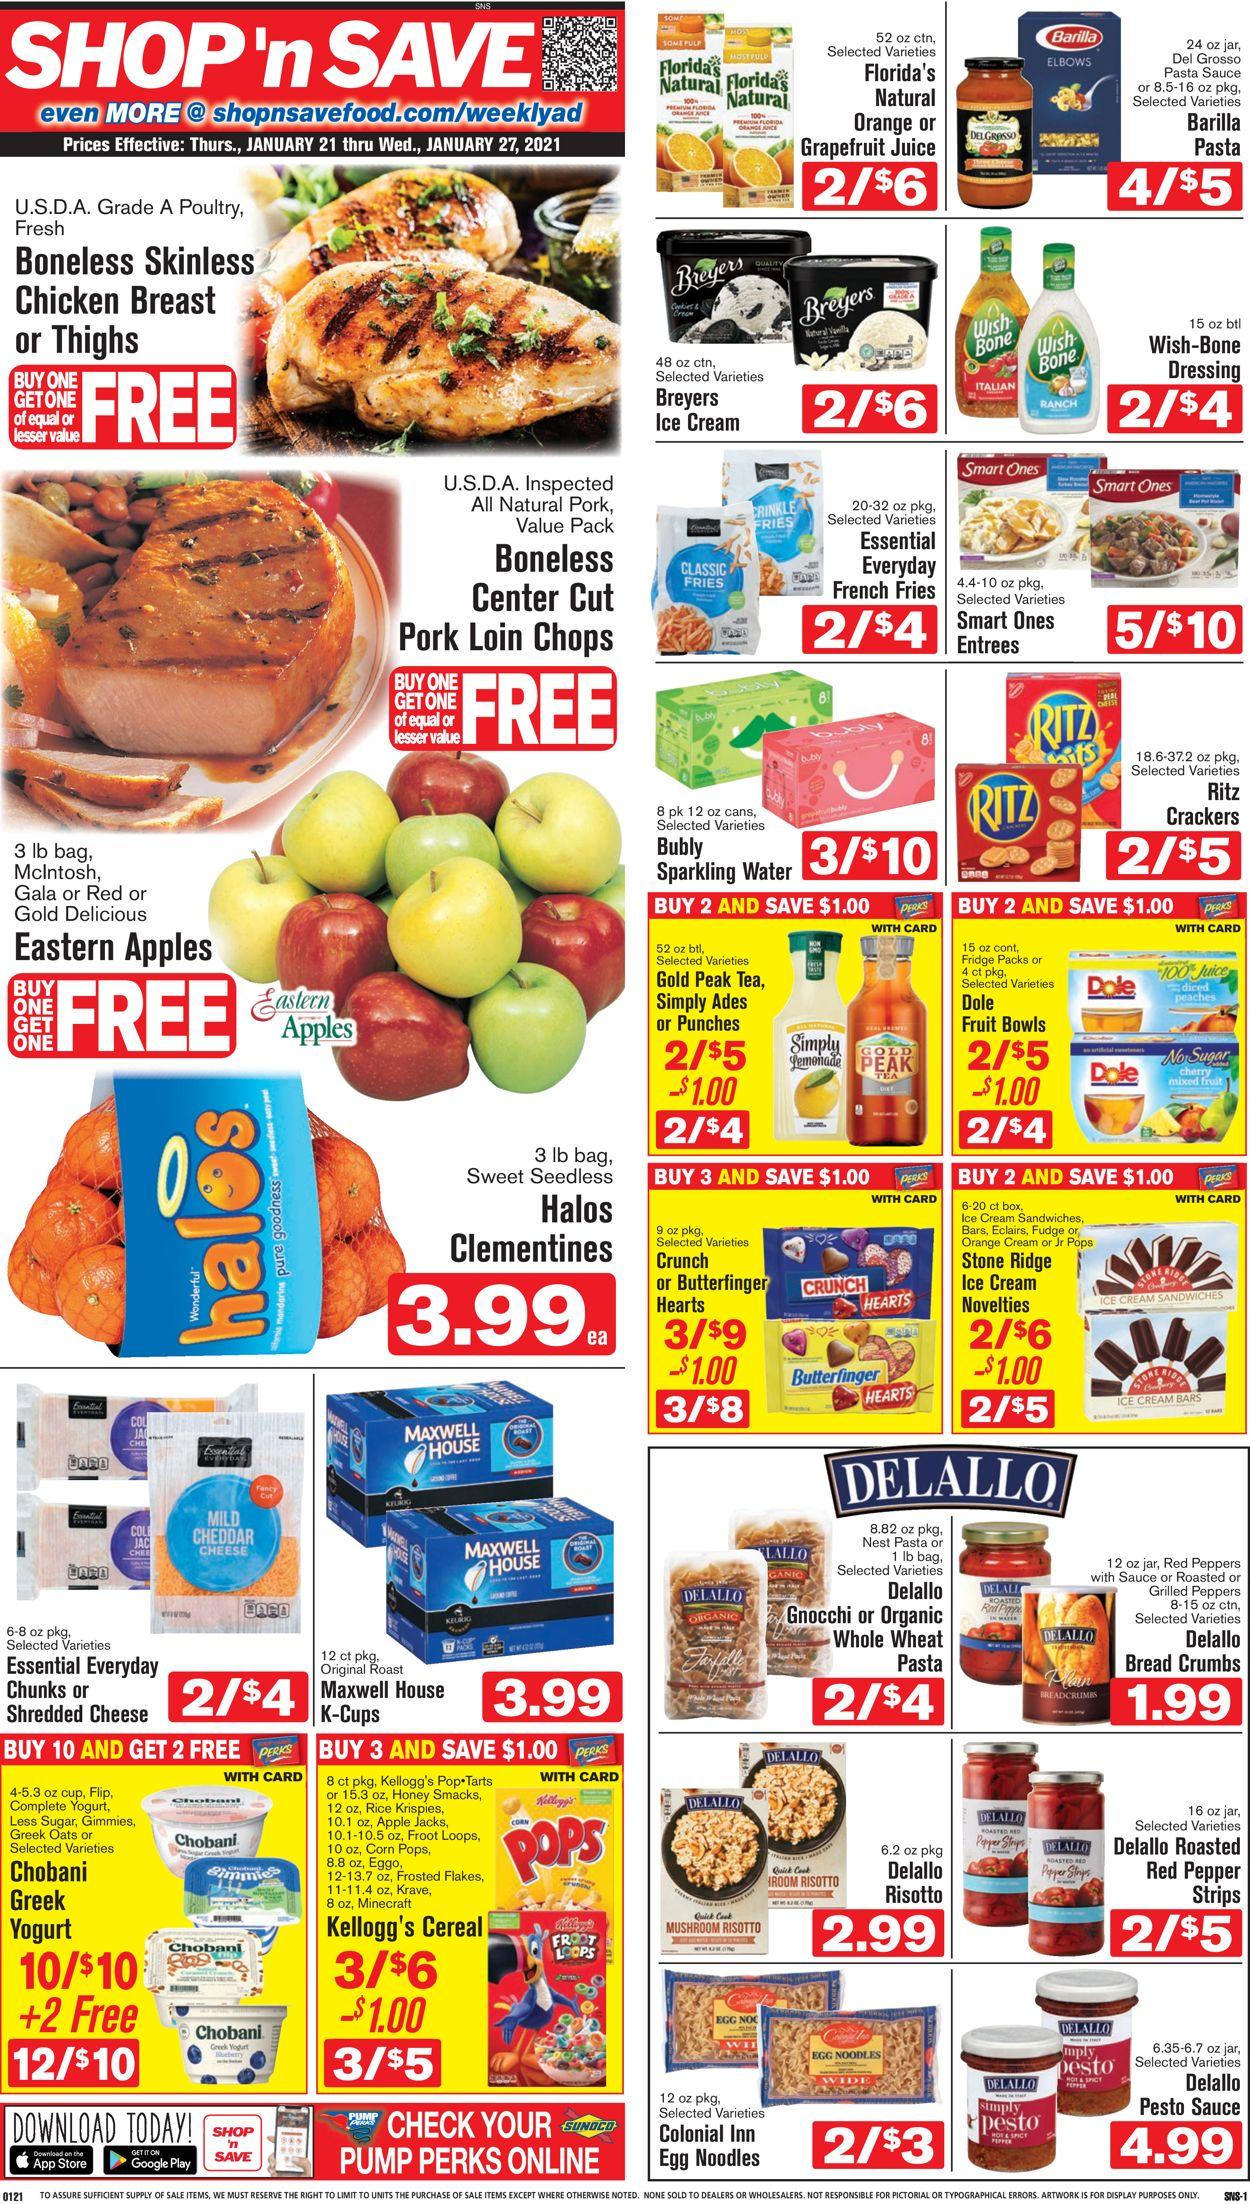 Shop 'n Save (Pittsburgh) Weekly Ad Circular - valid 01/21-01/27/2021